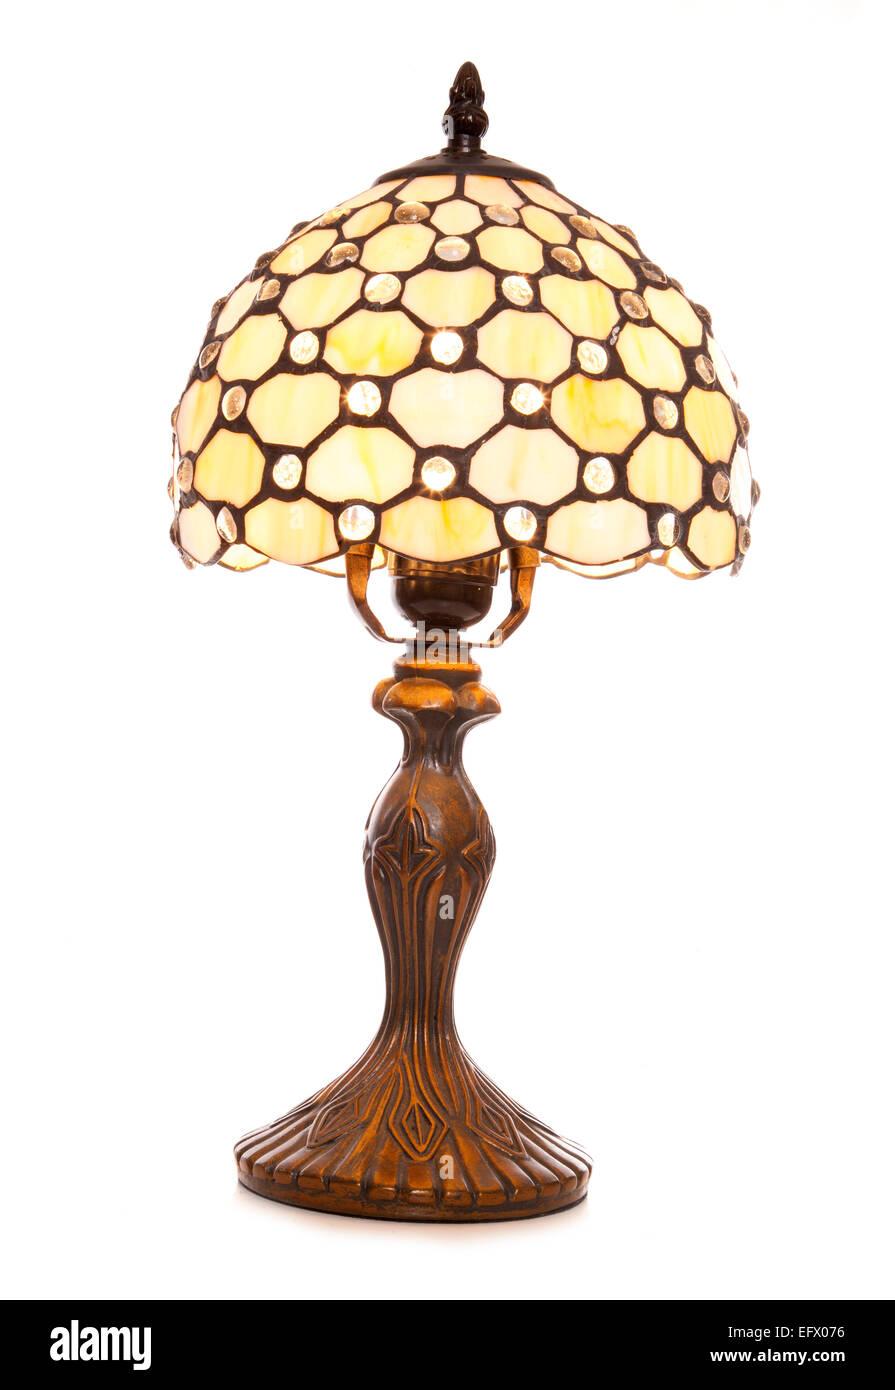 Vintage Style Table Lamp White Background Stock Photo 78632266 Alamy